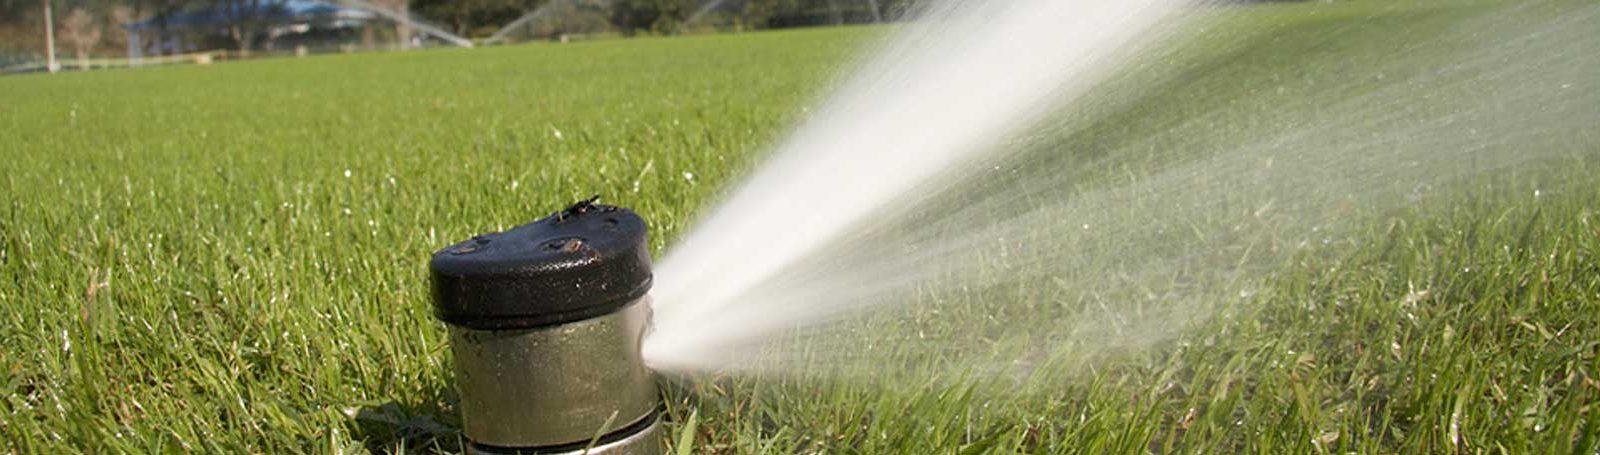 darling-Irrigation-broken-hill-storm-water-capture-case-study